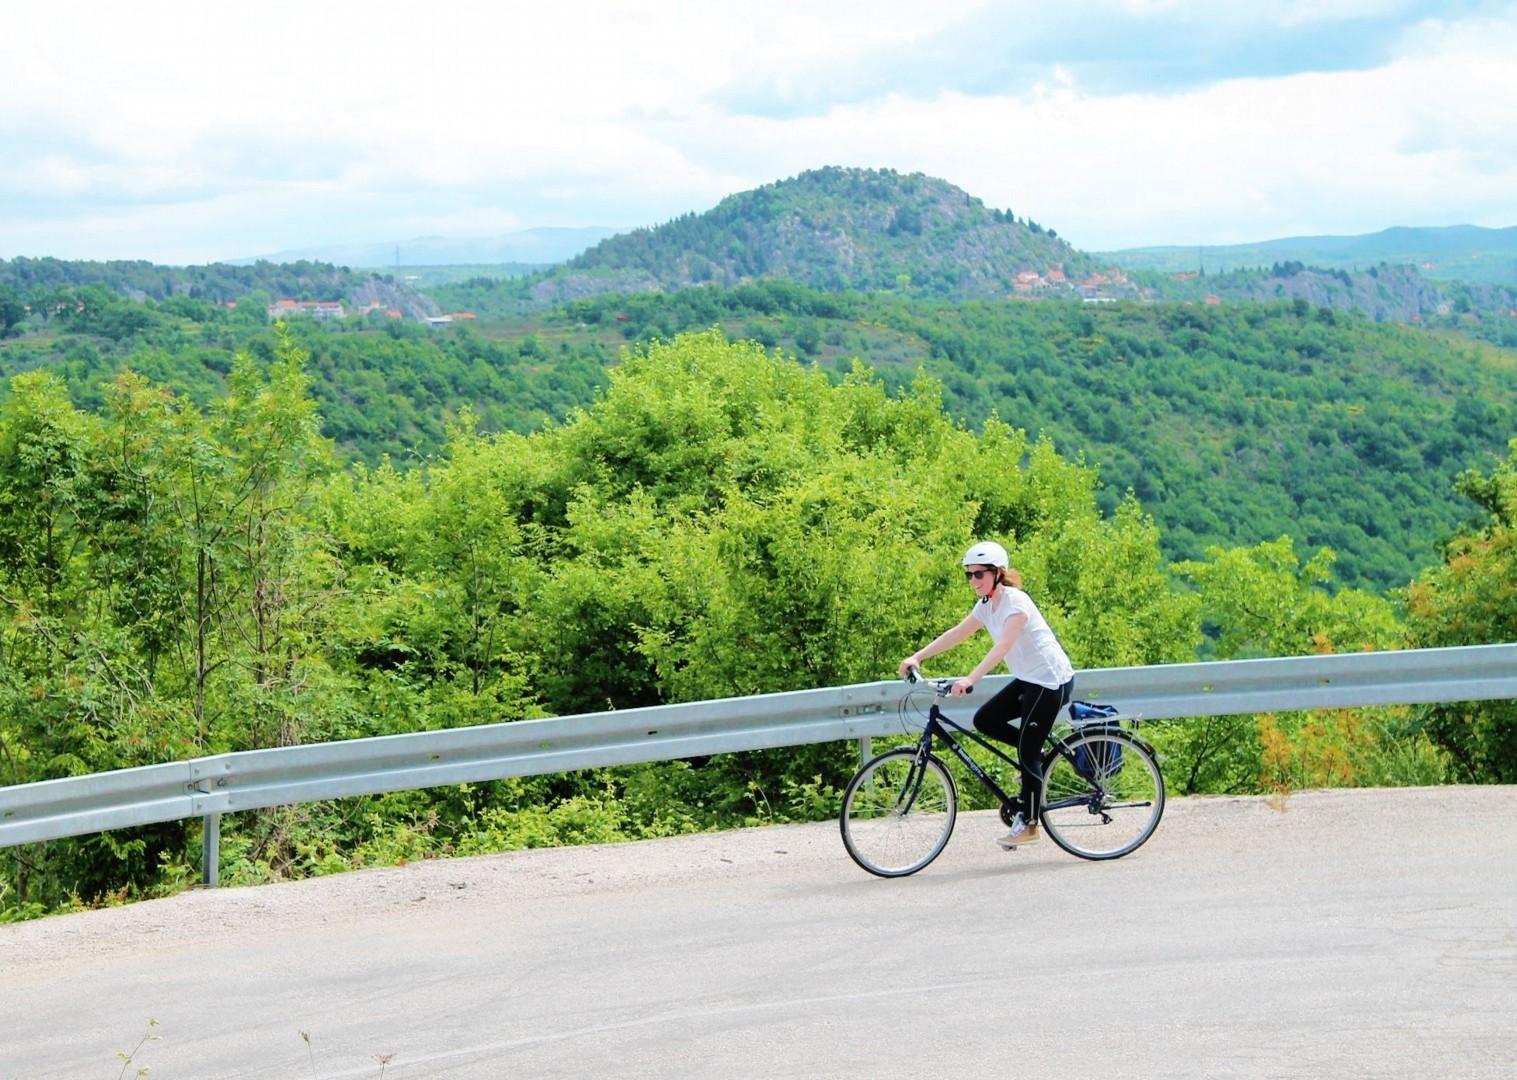 road-to-the-sky-dugi-otok-croatian-holiday-on-bike.jpg - Croatia - Kvarner Bay - Bike and Boat Holiday - Leisure Cycling